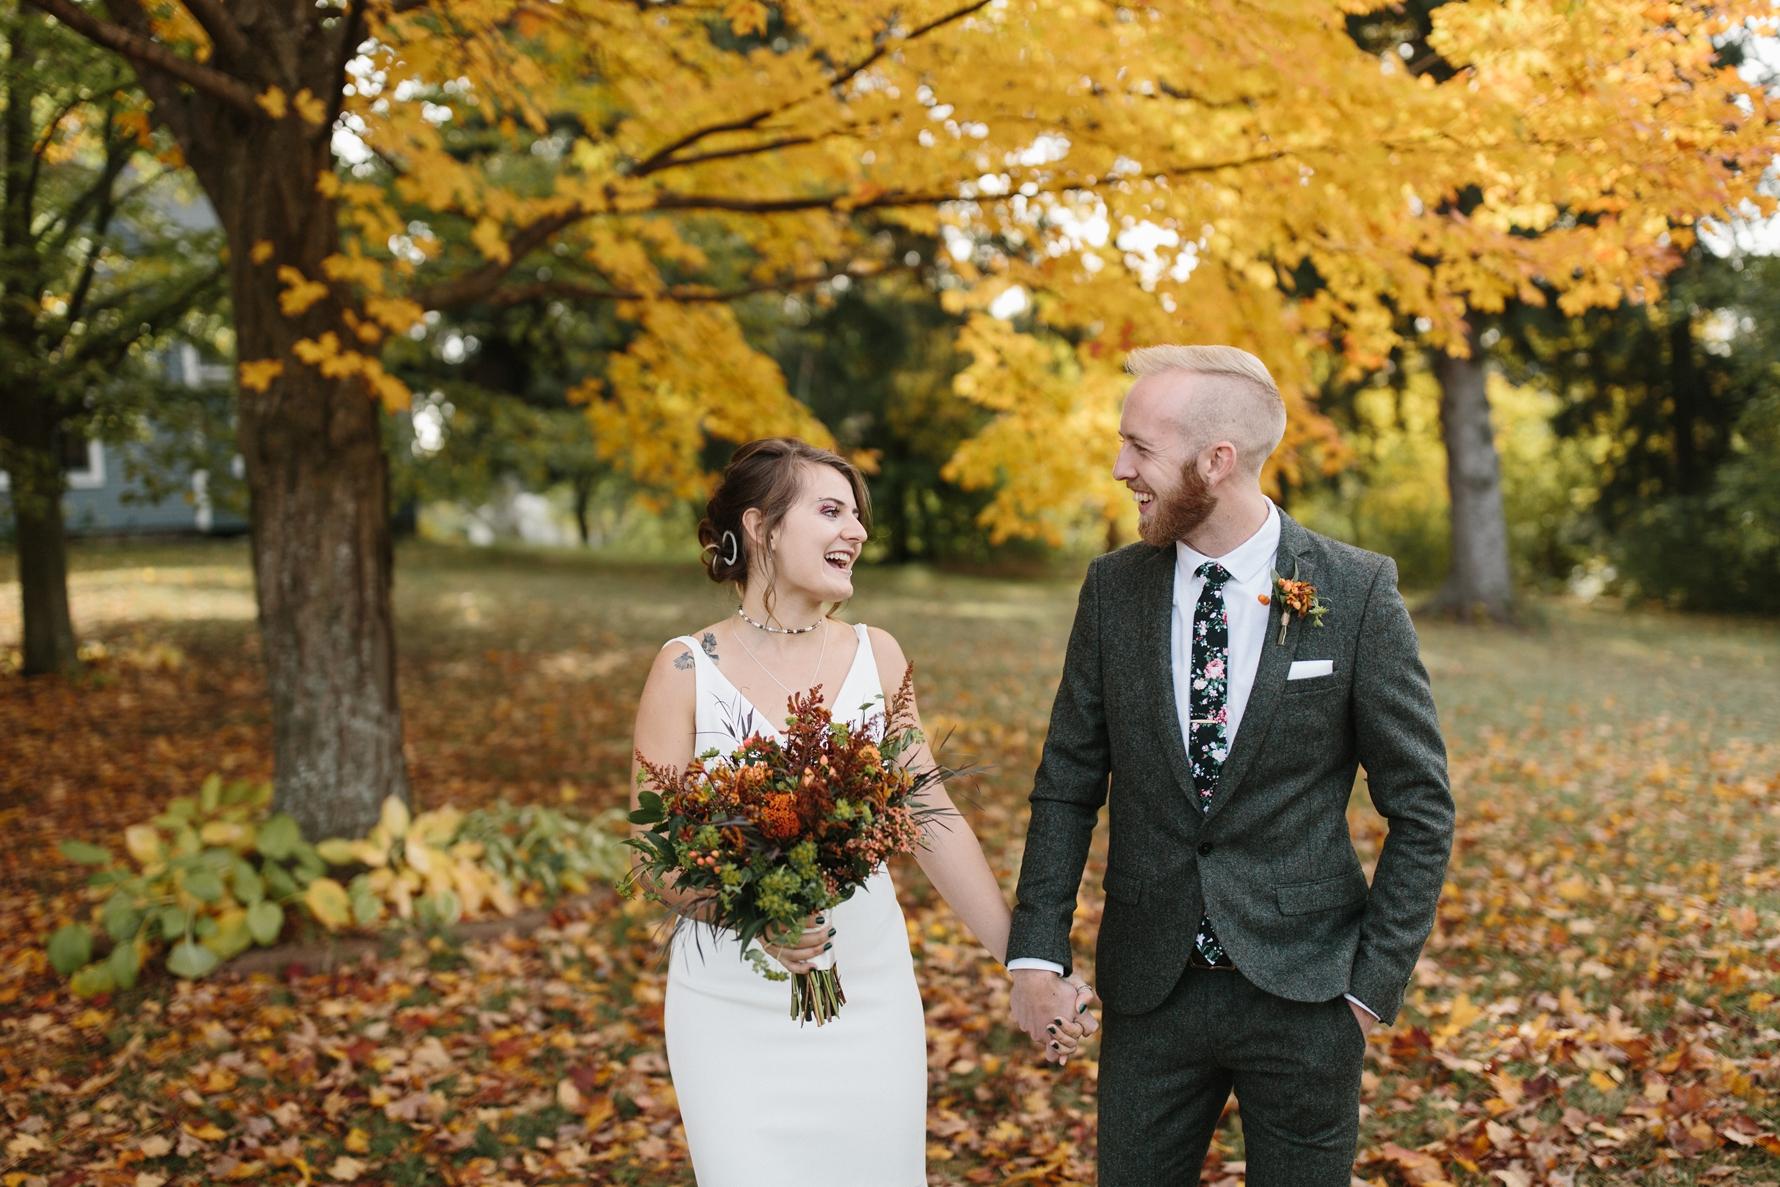 norris-traverse-city-wedding-29.JPG